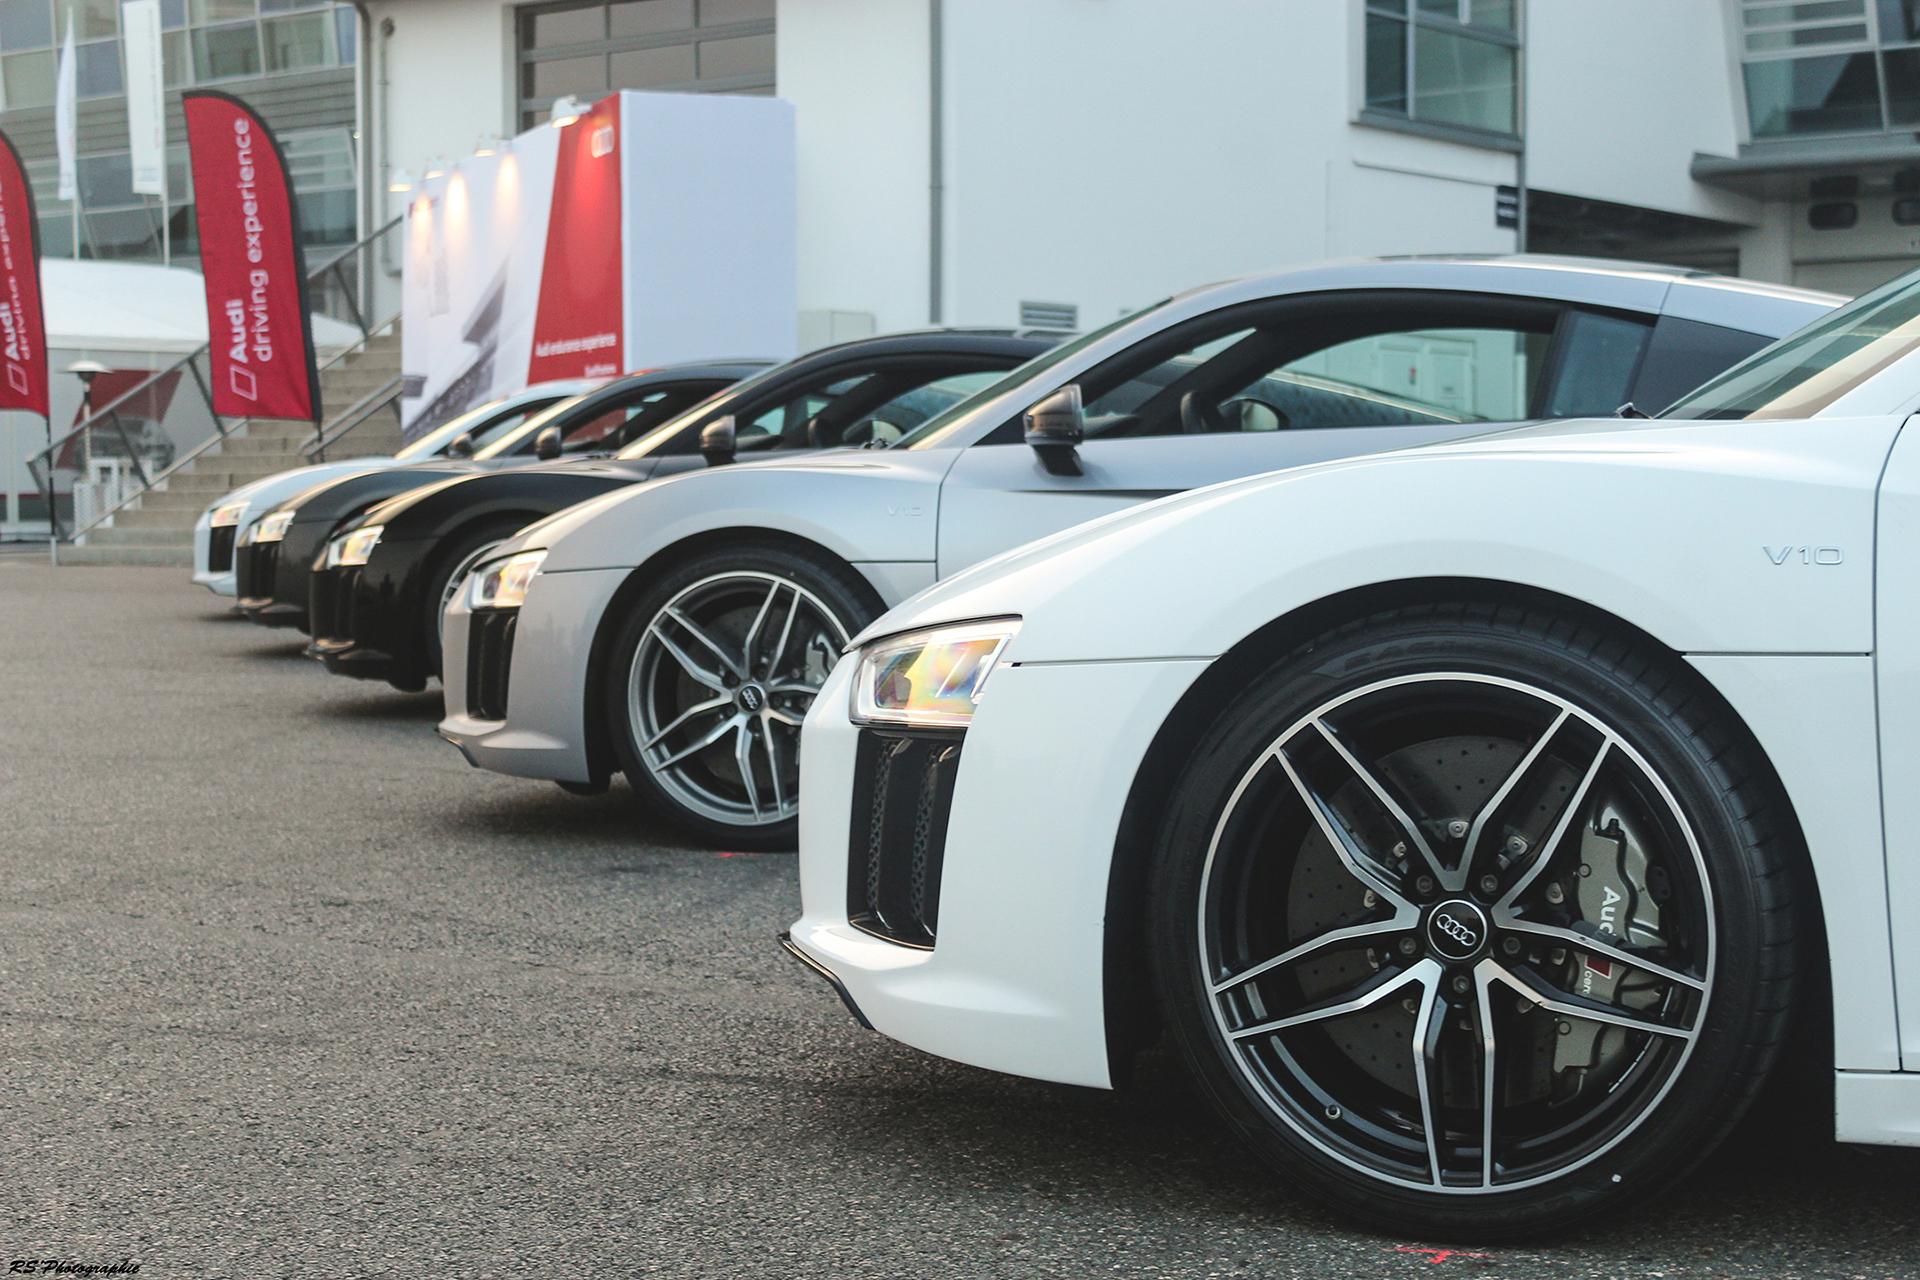 Audi automobiles - bienvenue - photo Arnaud Demasier